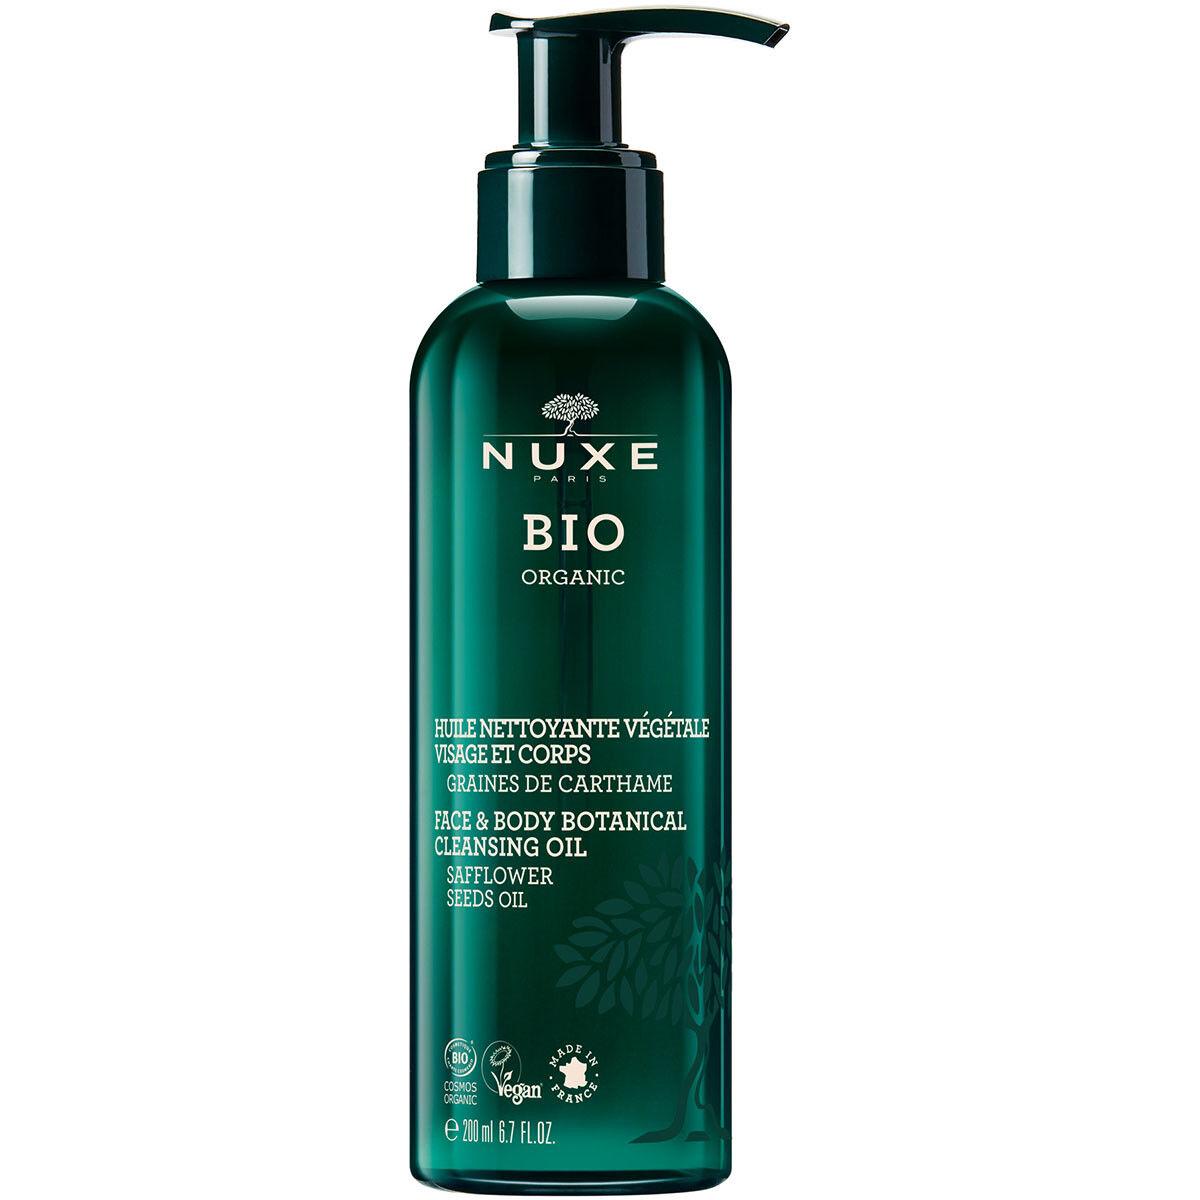 BIO BEAUTE NUXE Nuxe bio huile nettoyante vegetale 200ml